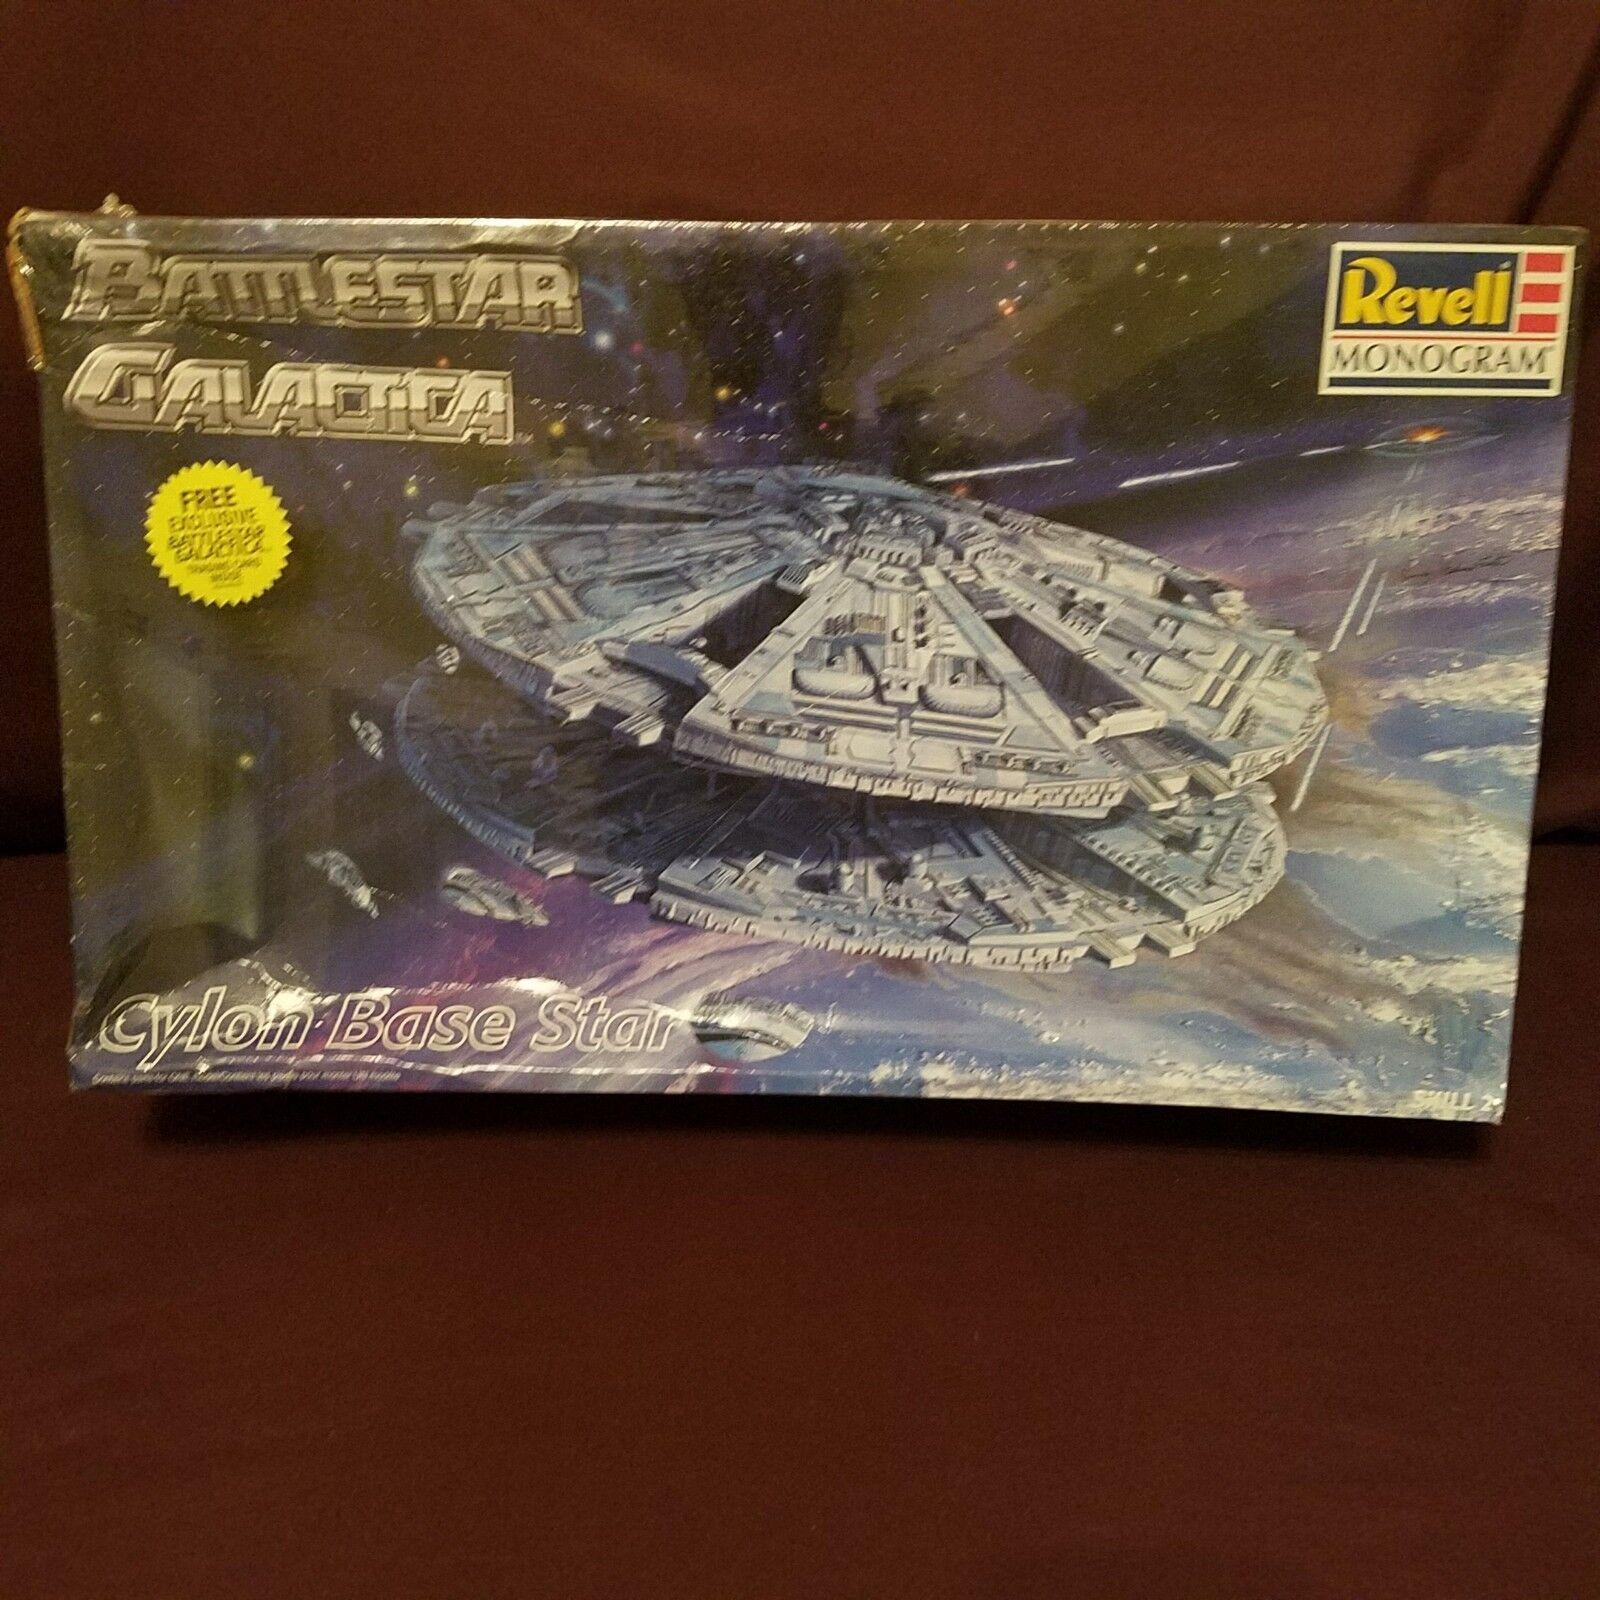 Battlestar Galactica Cylon Base Star New  By Revell New  Original Cellophane